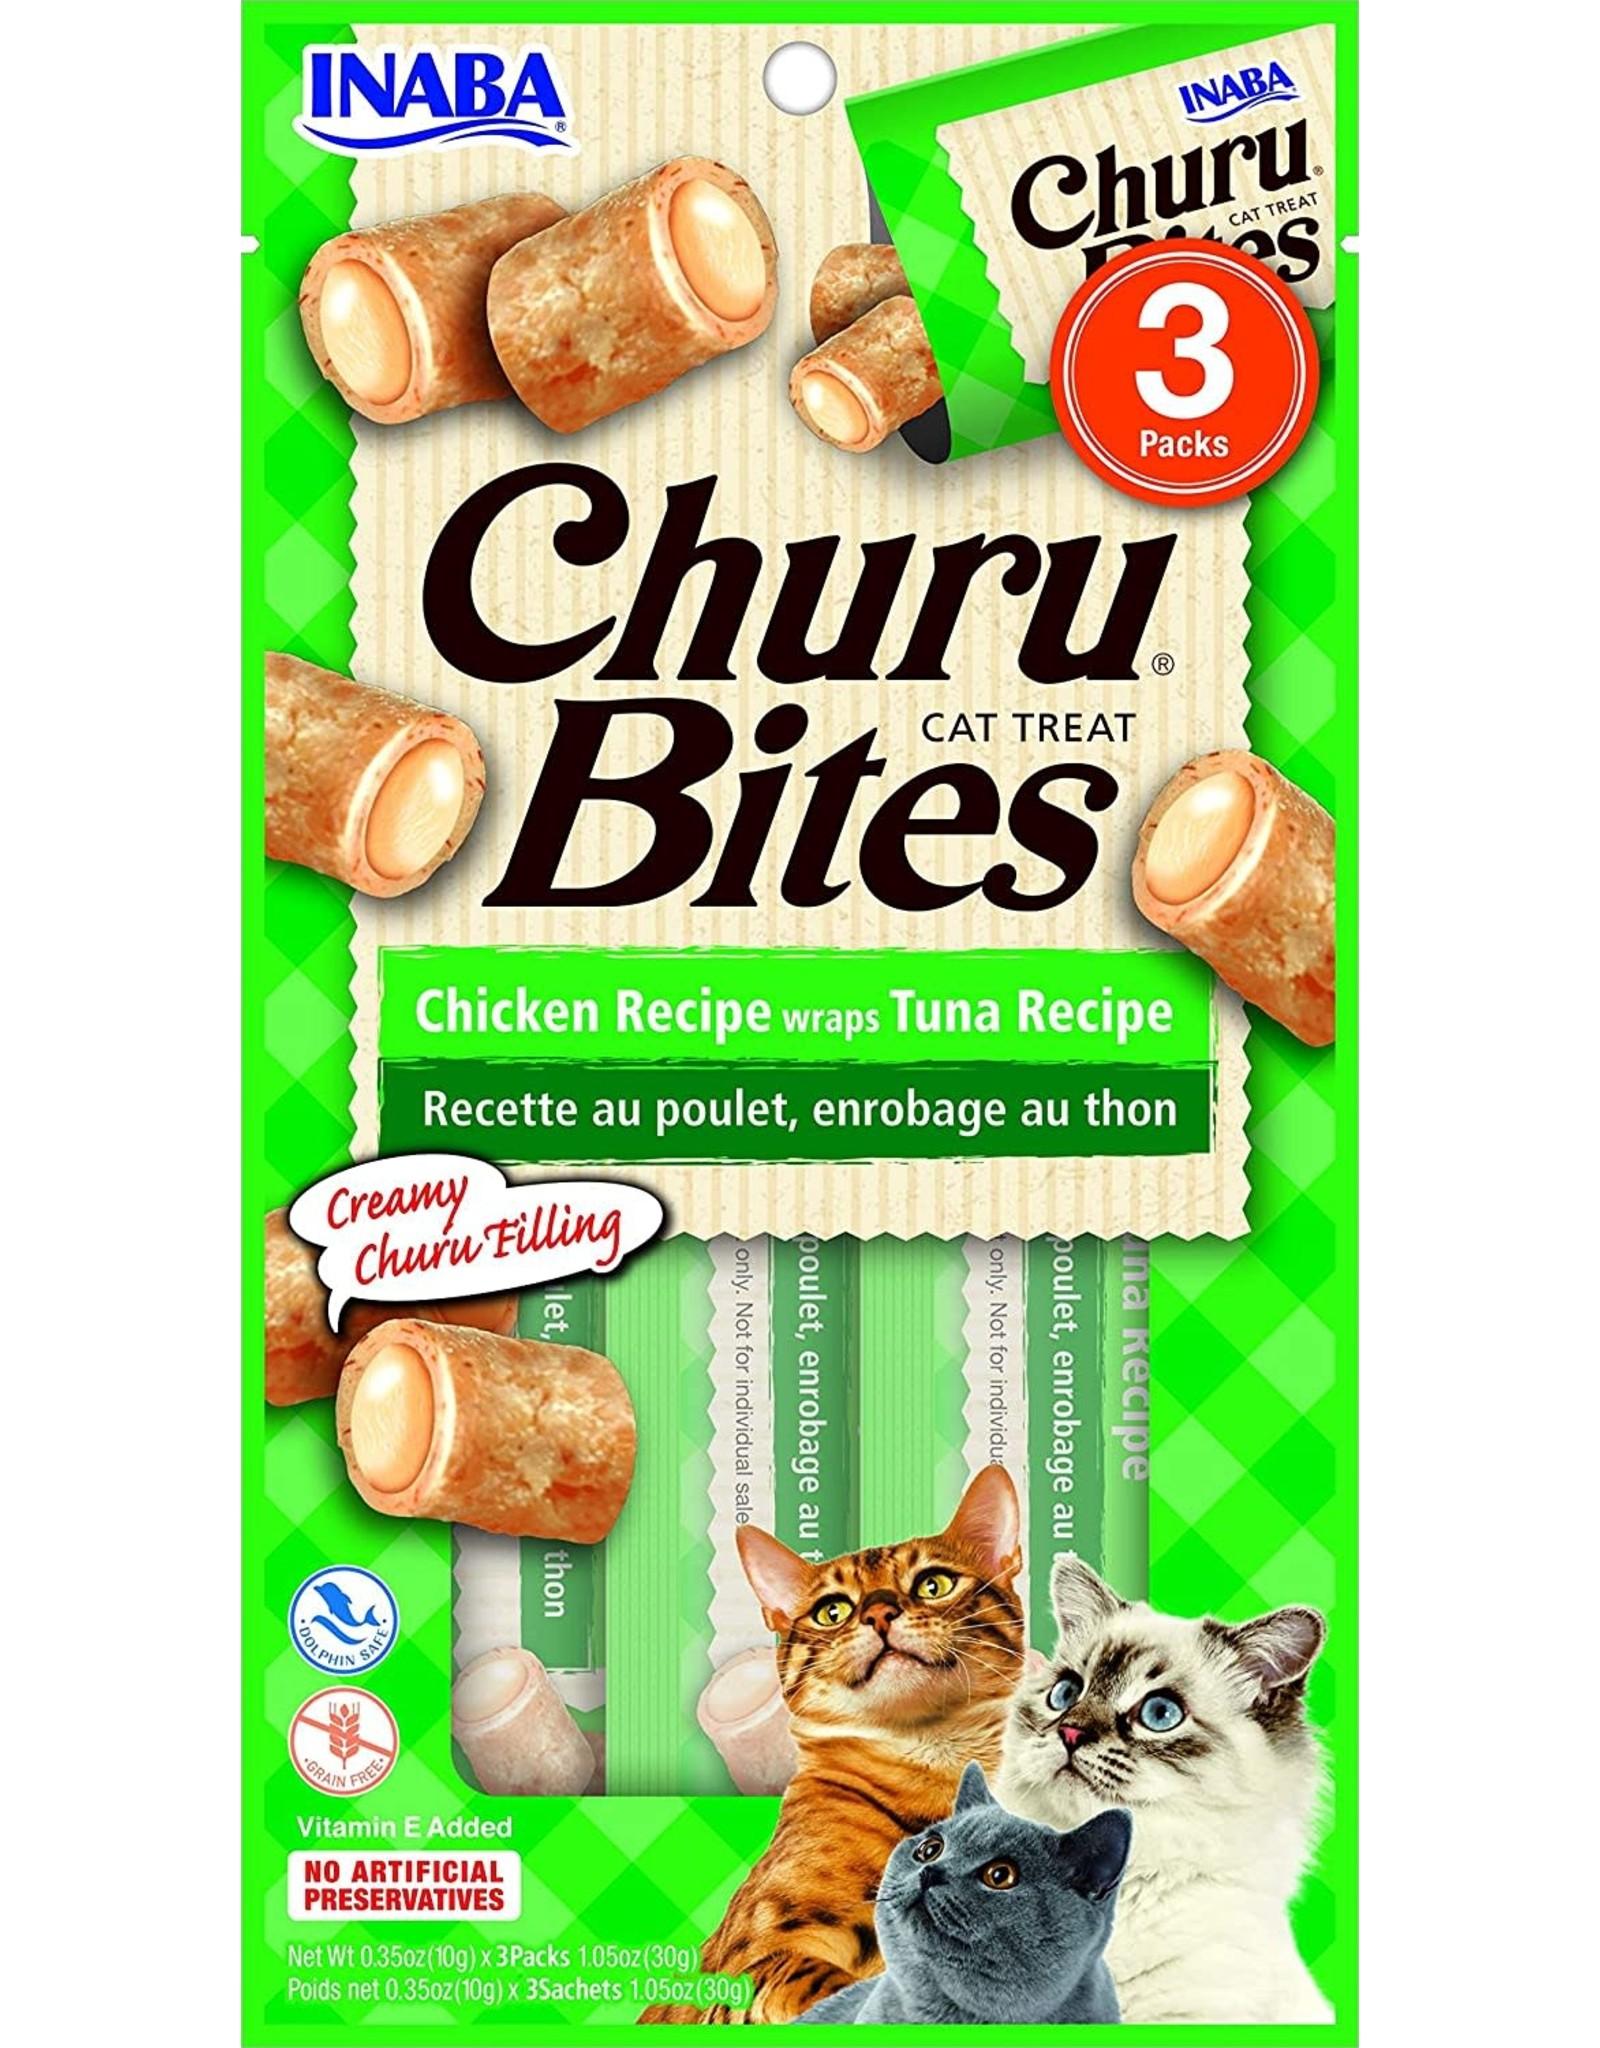 Inaba INABA CAT CHURU BITES CHICKEN RECIPE WRAPS TUNA RECIPE 3-COUNT